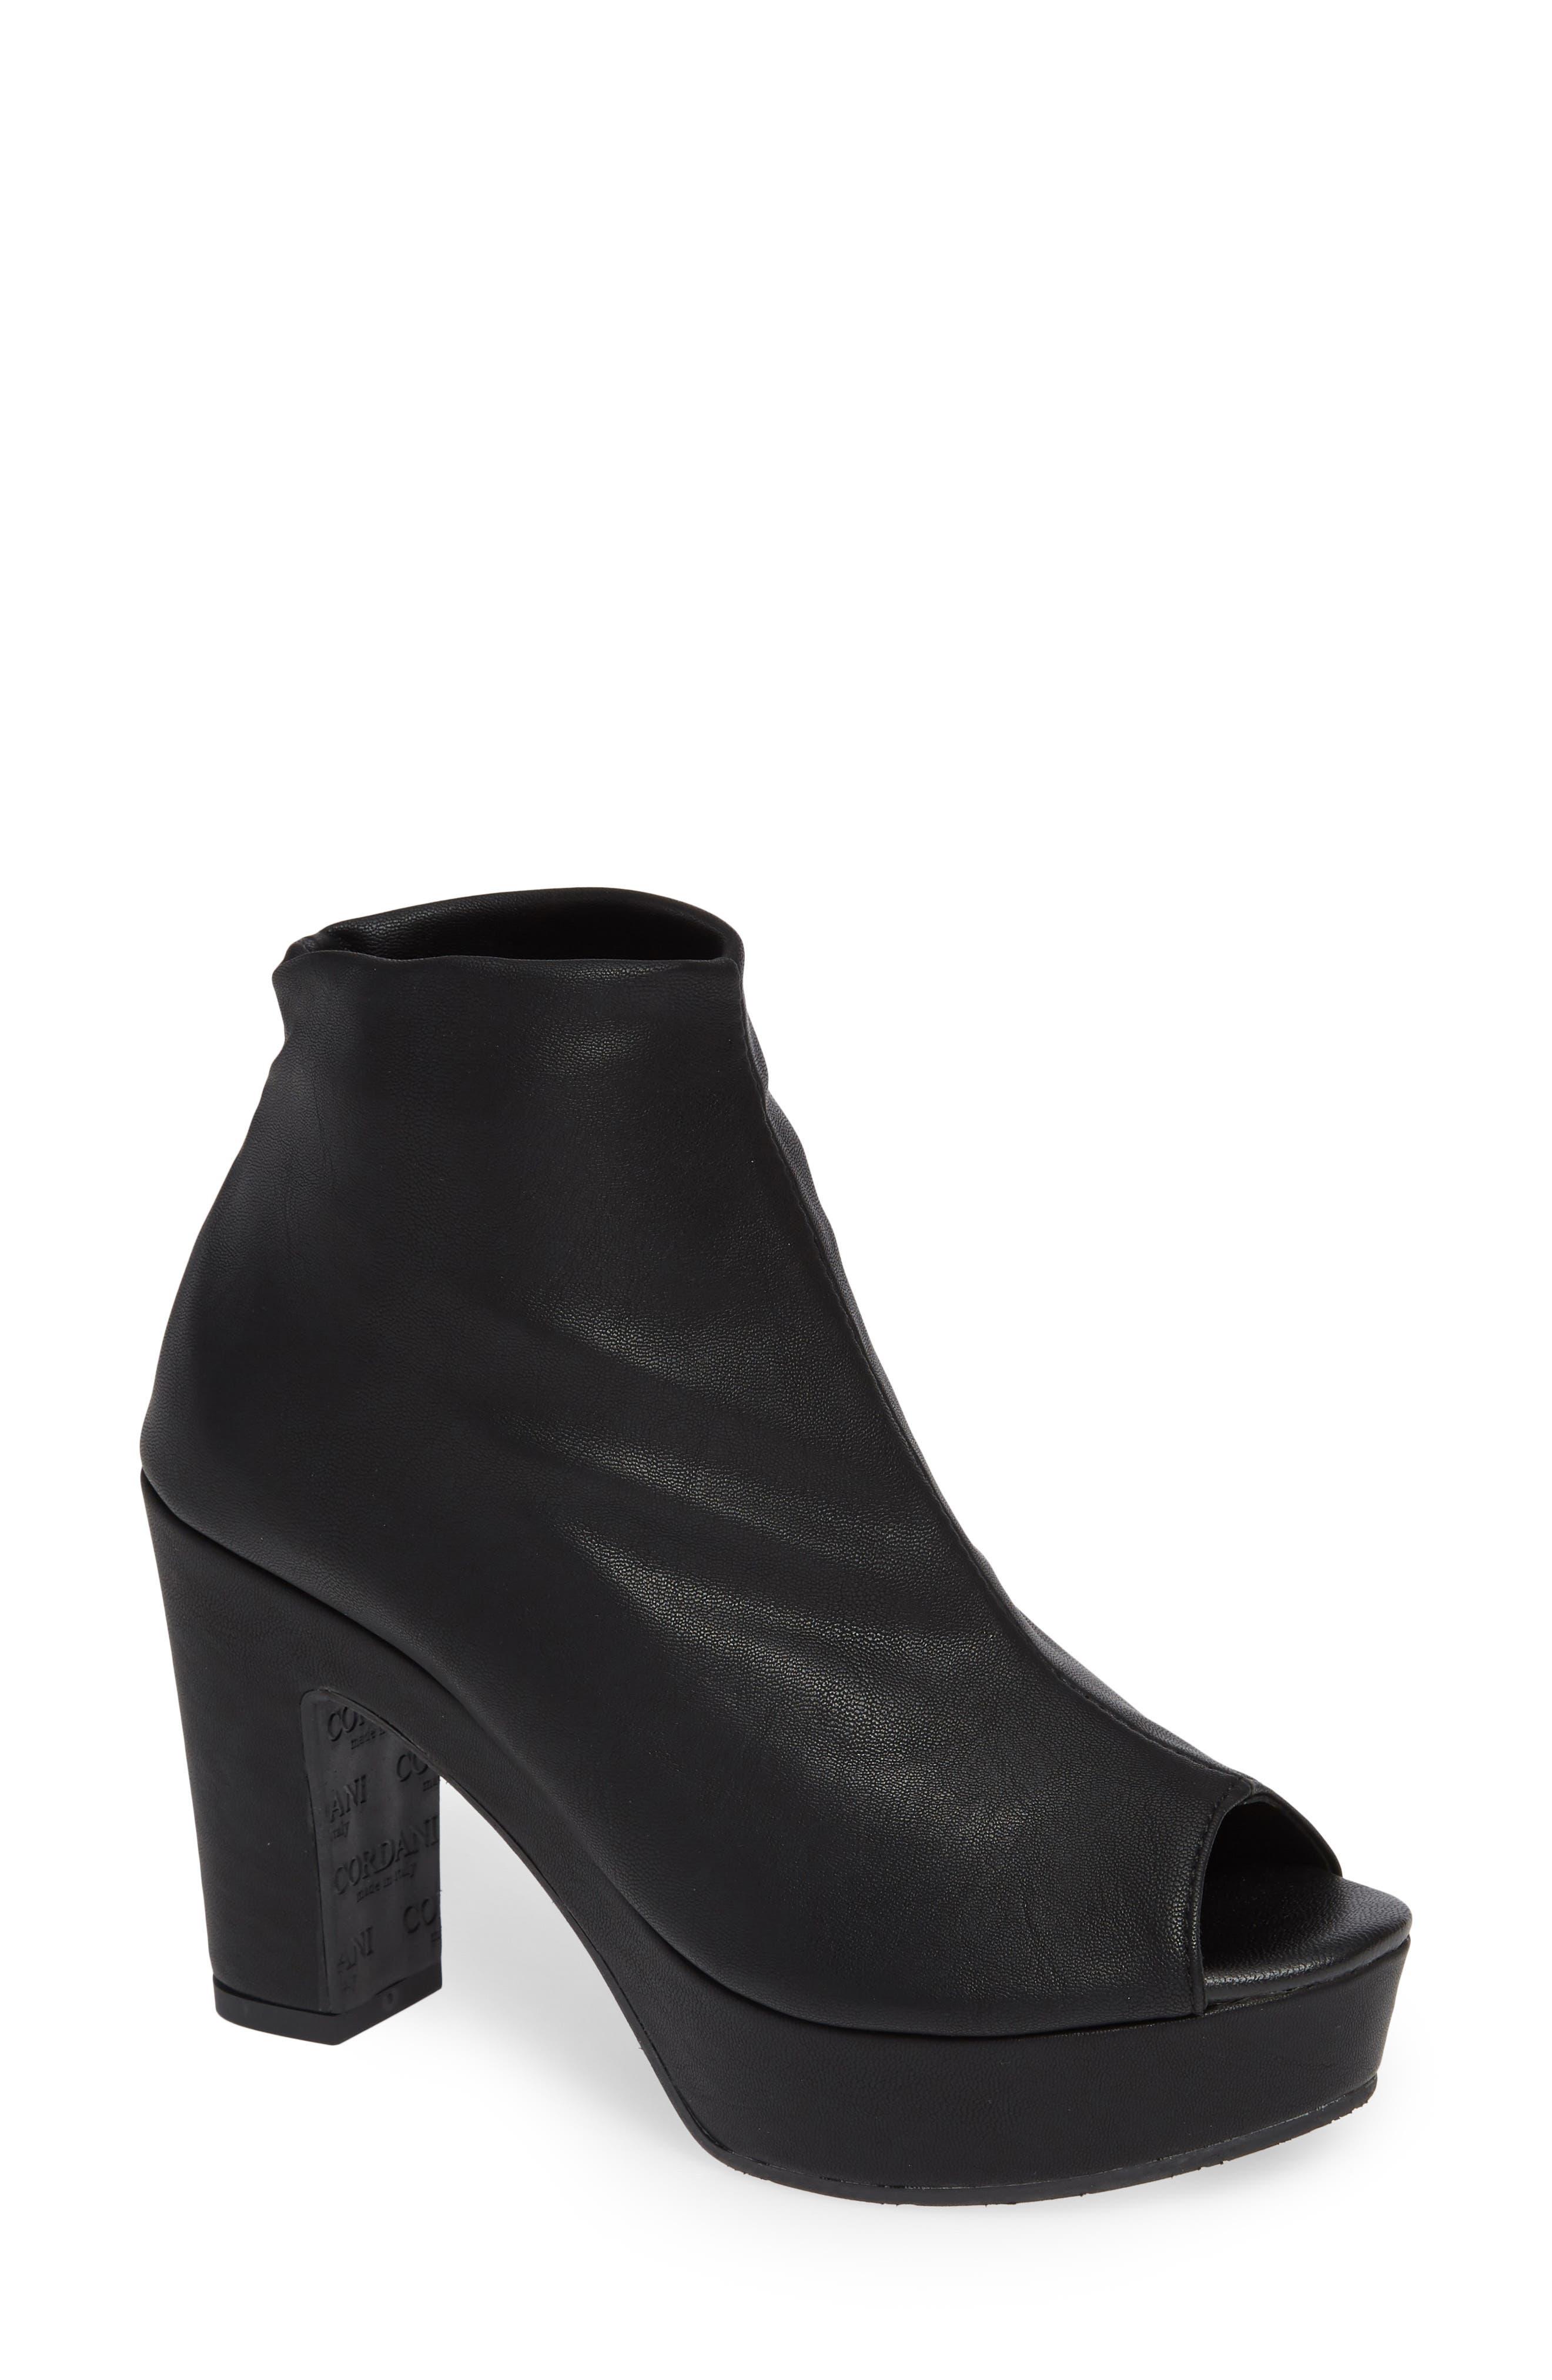 Tyra Peep Toe Platform Bootie,                             Main thumbnail 1, color,                             Black Fabric